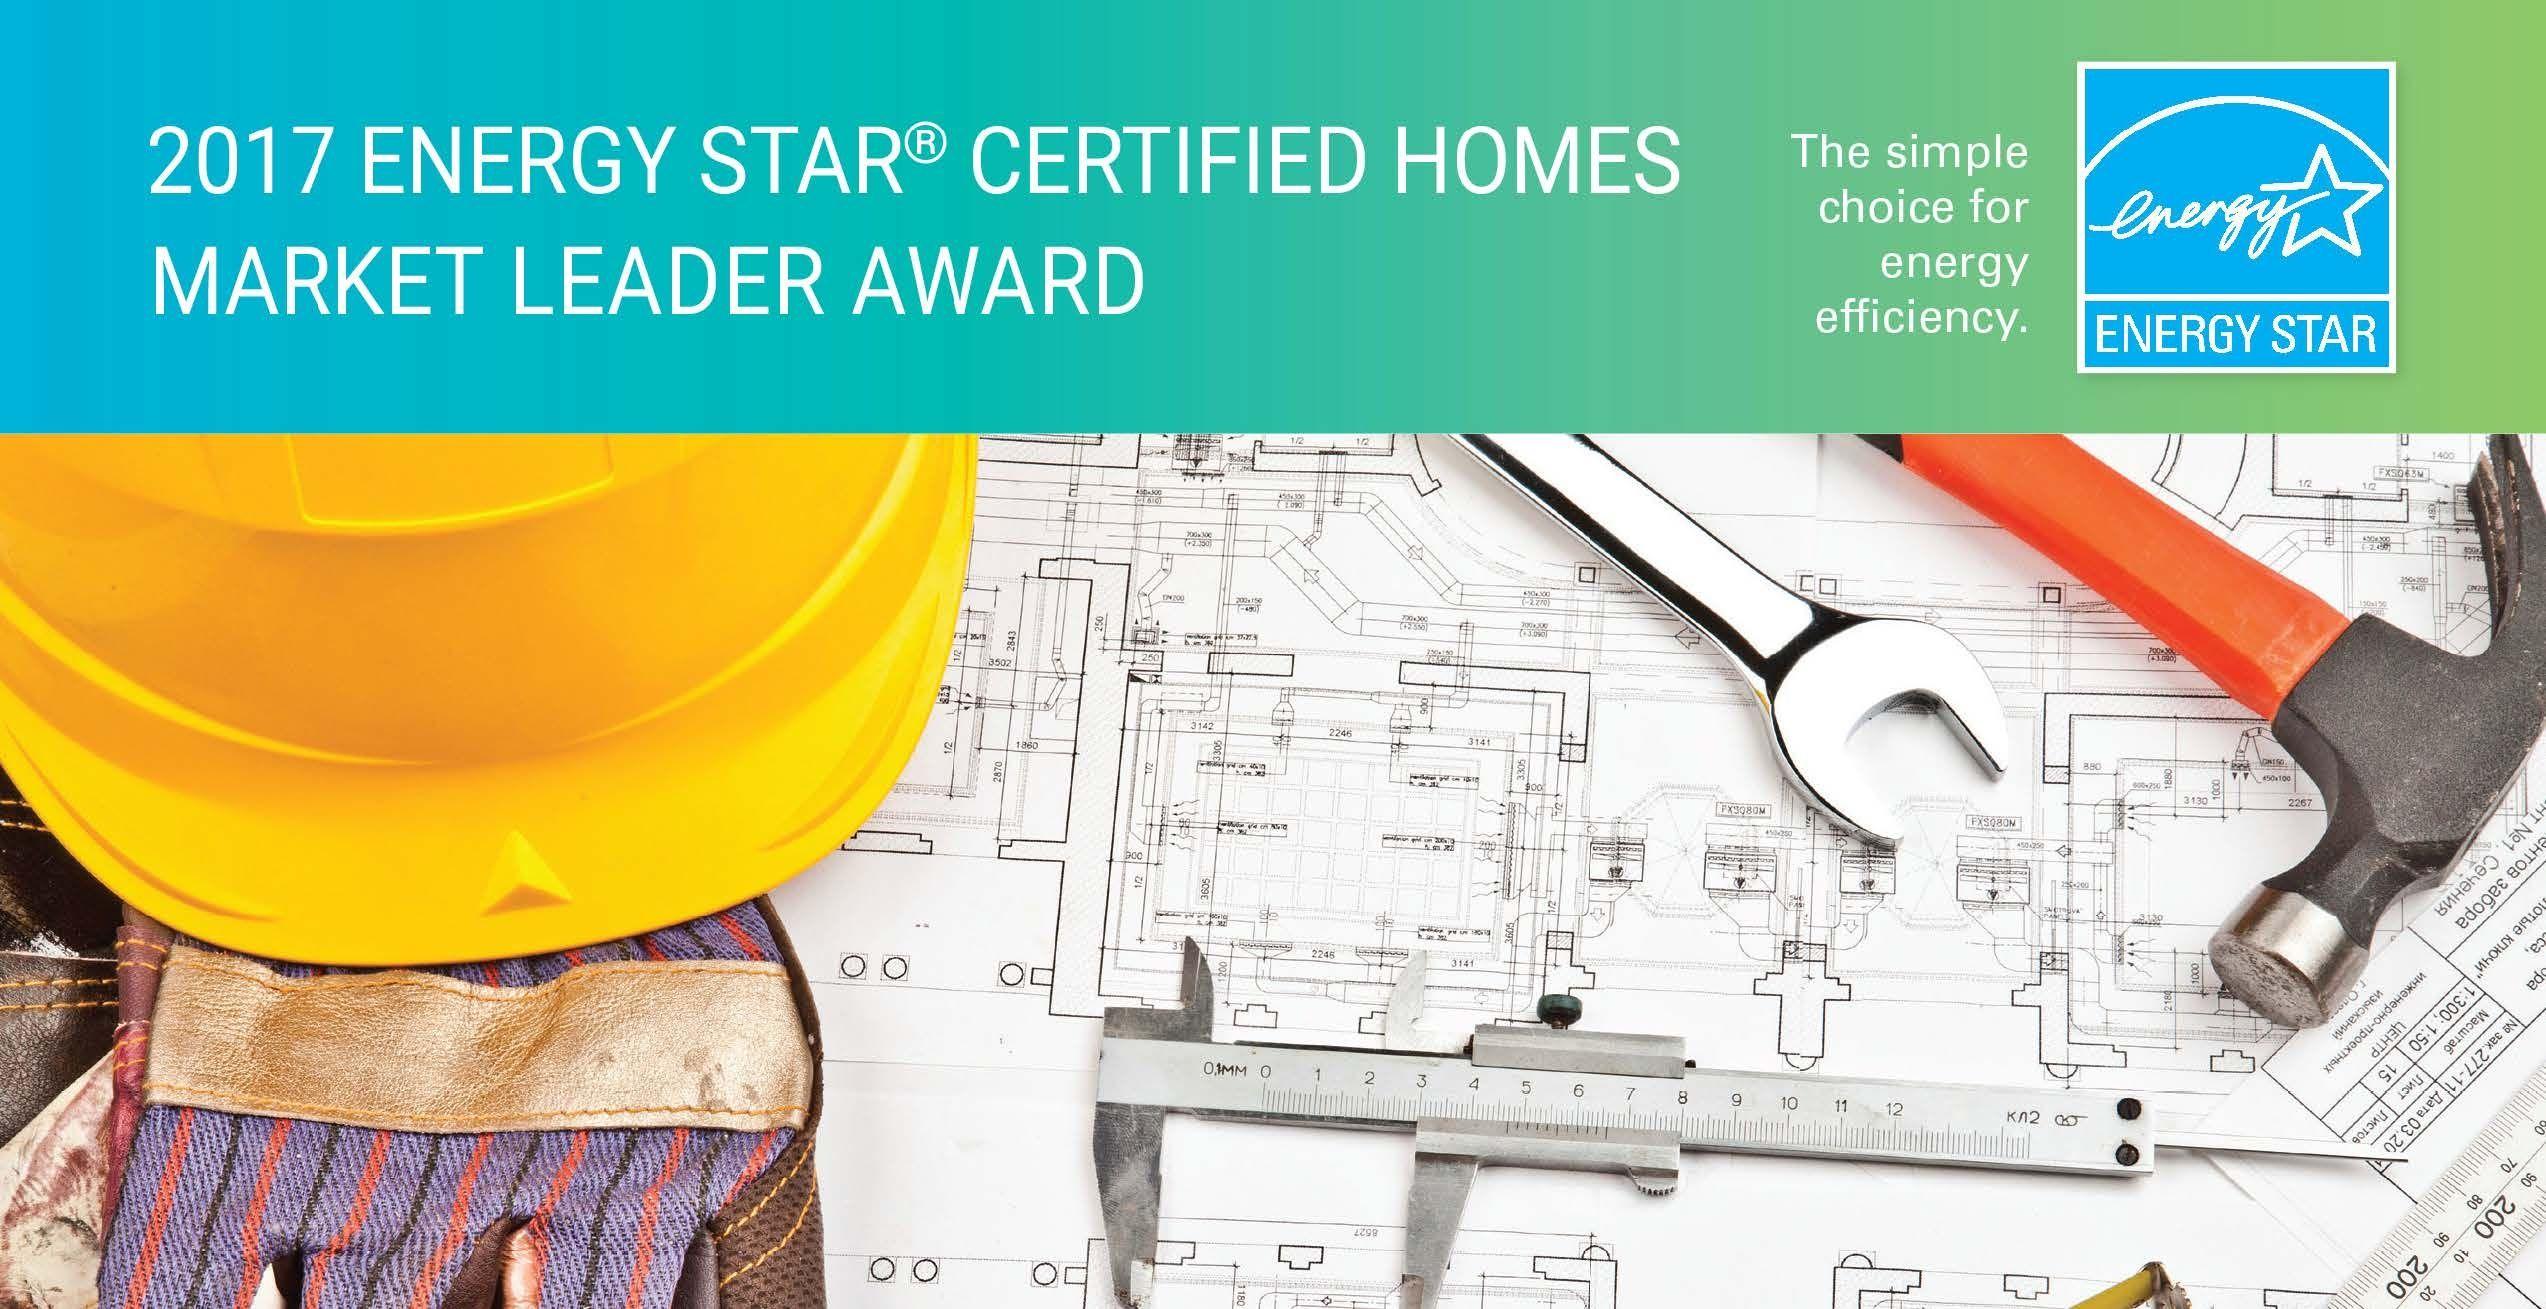 Design Tech Homes Earns the 2017 Energy Star Market Leader Award 1